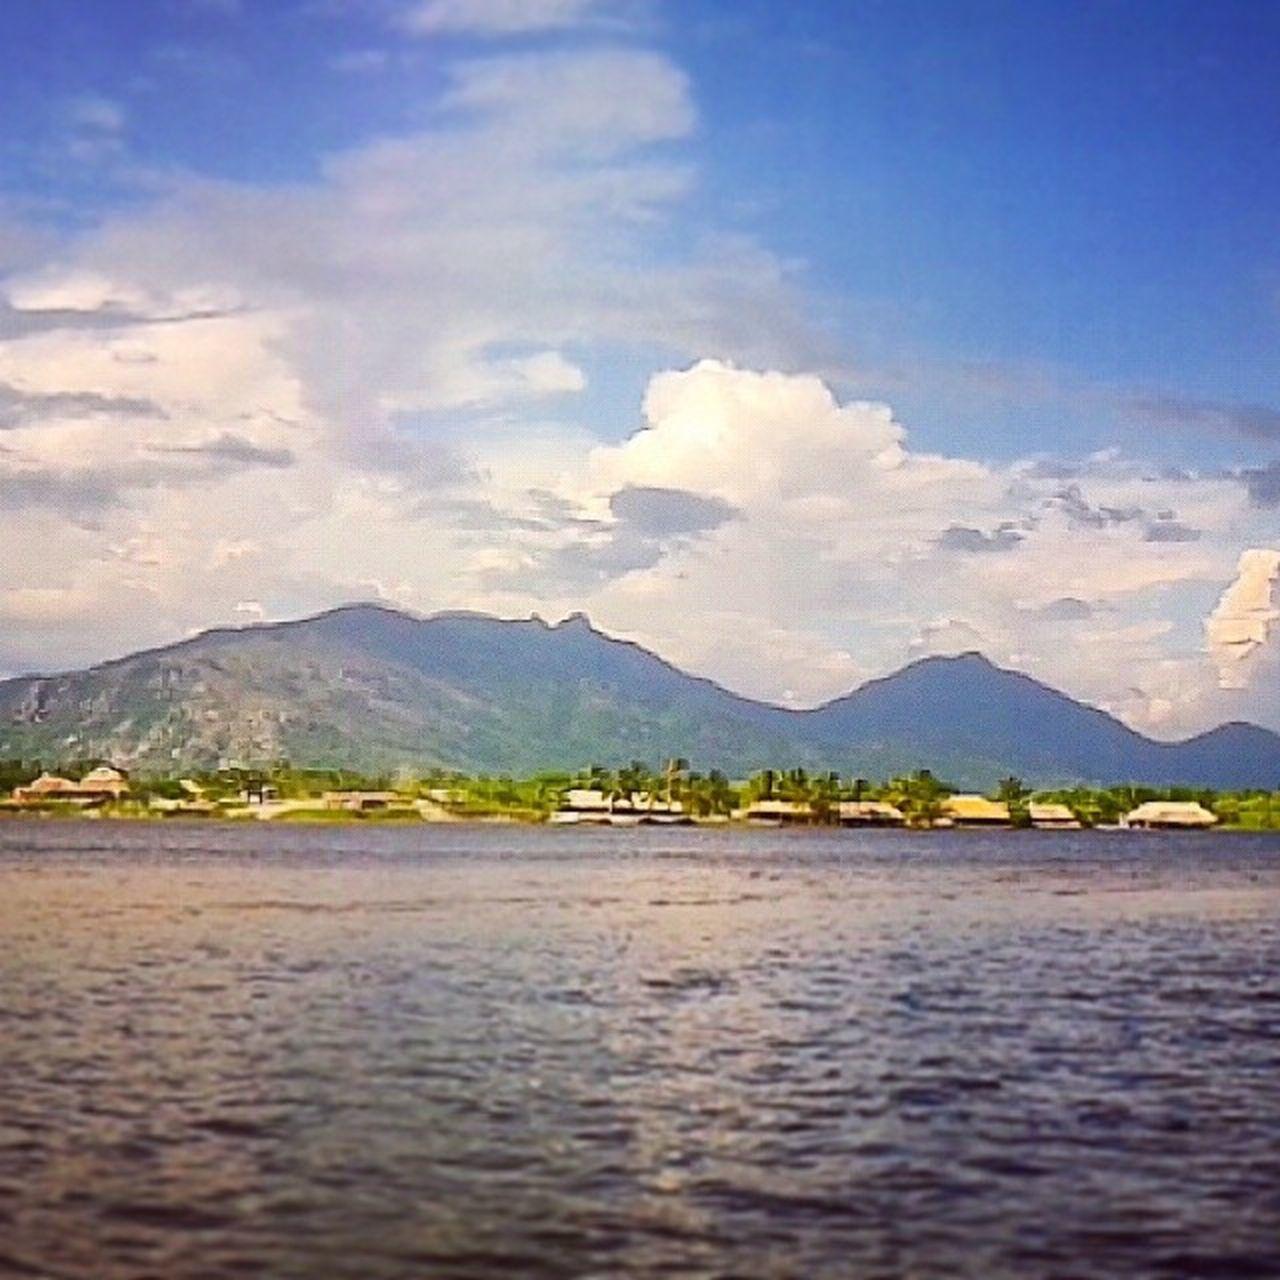 Viaje Chiapas Playa Boca Del.cielo Chiapas The Great Outdoors - 2016 EyeEm Awards